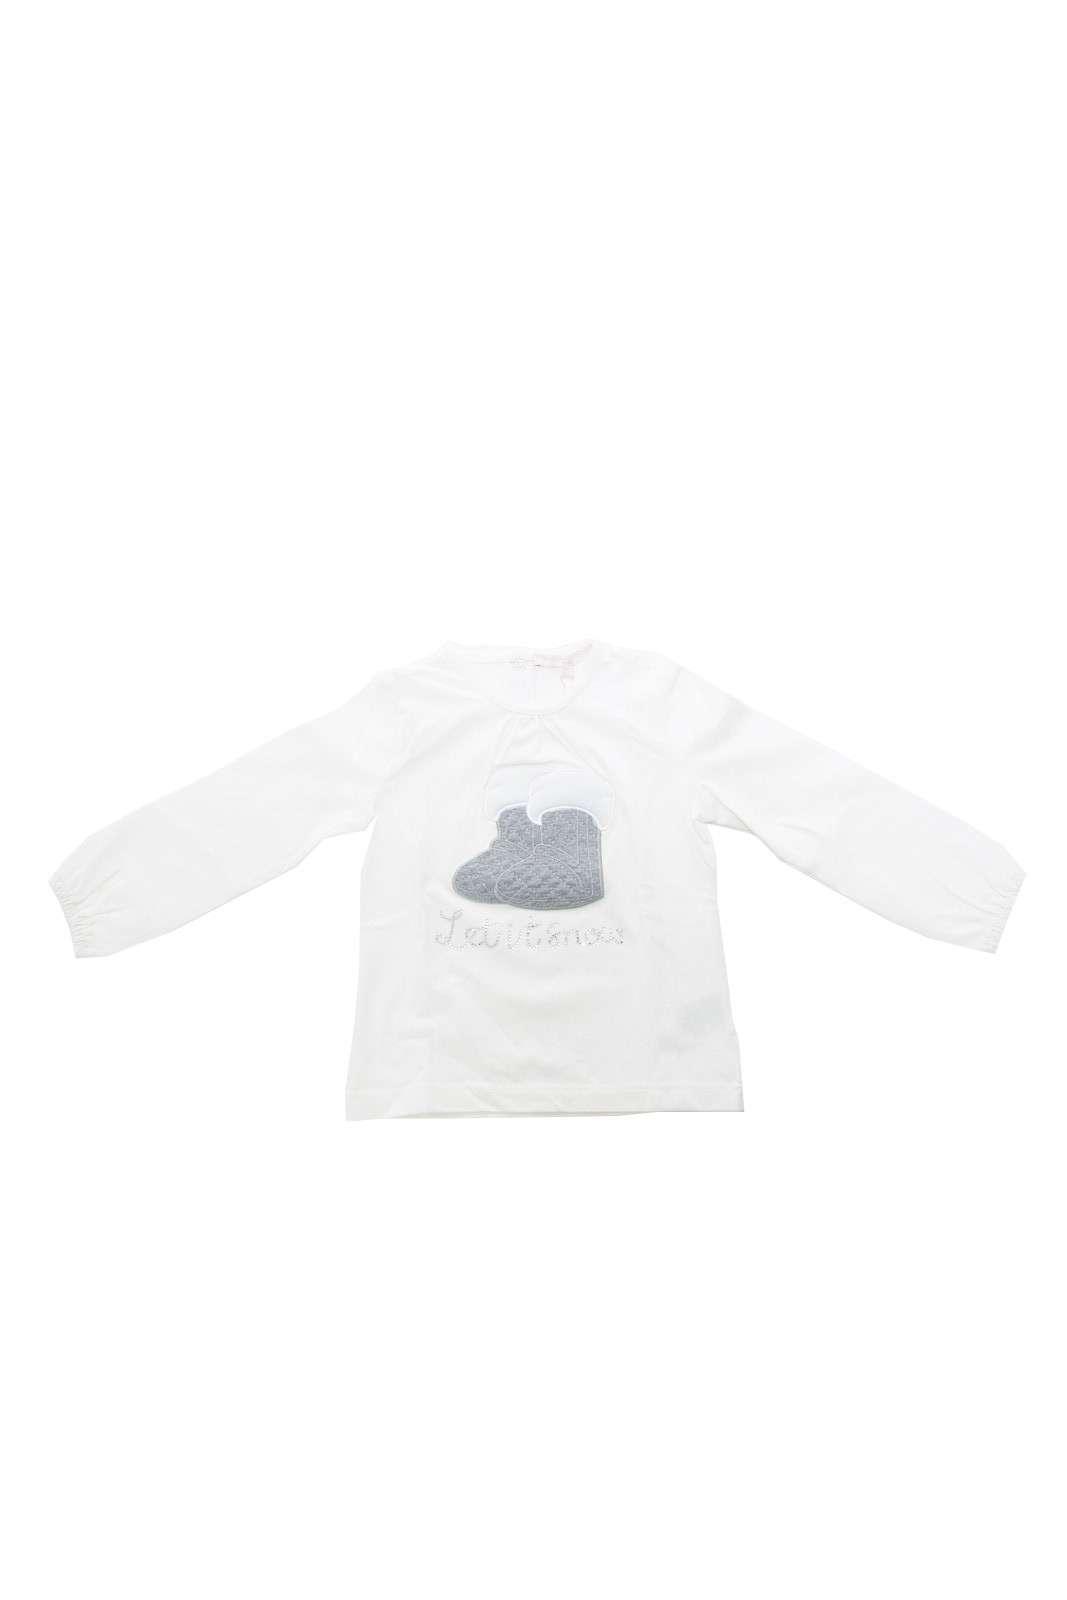 https://www.parmax.com/media/catalog/product/a/i/PE-outlet_parmax-t-shirt-bambina-Silvian-Heach-NNDI5154TS-A.jpg